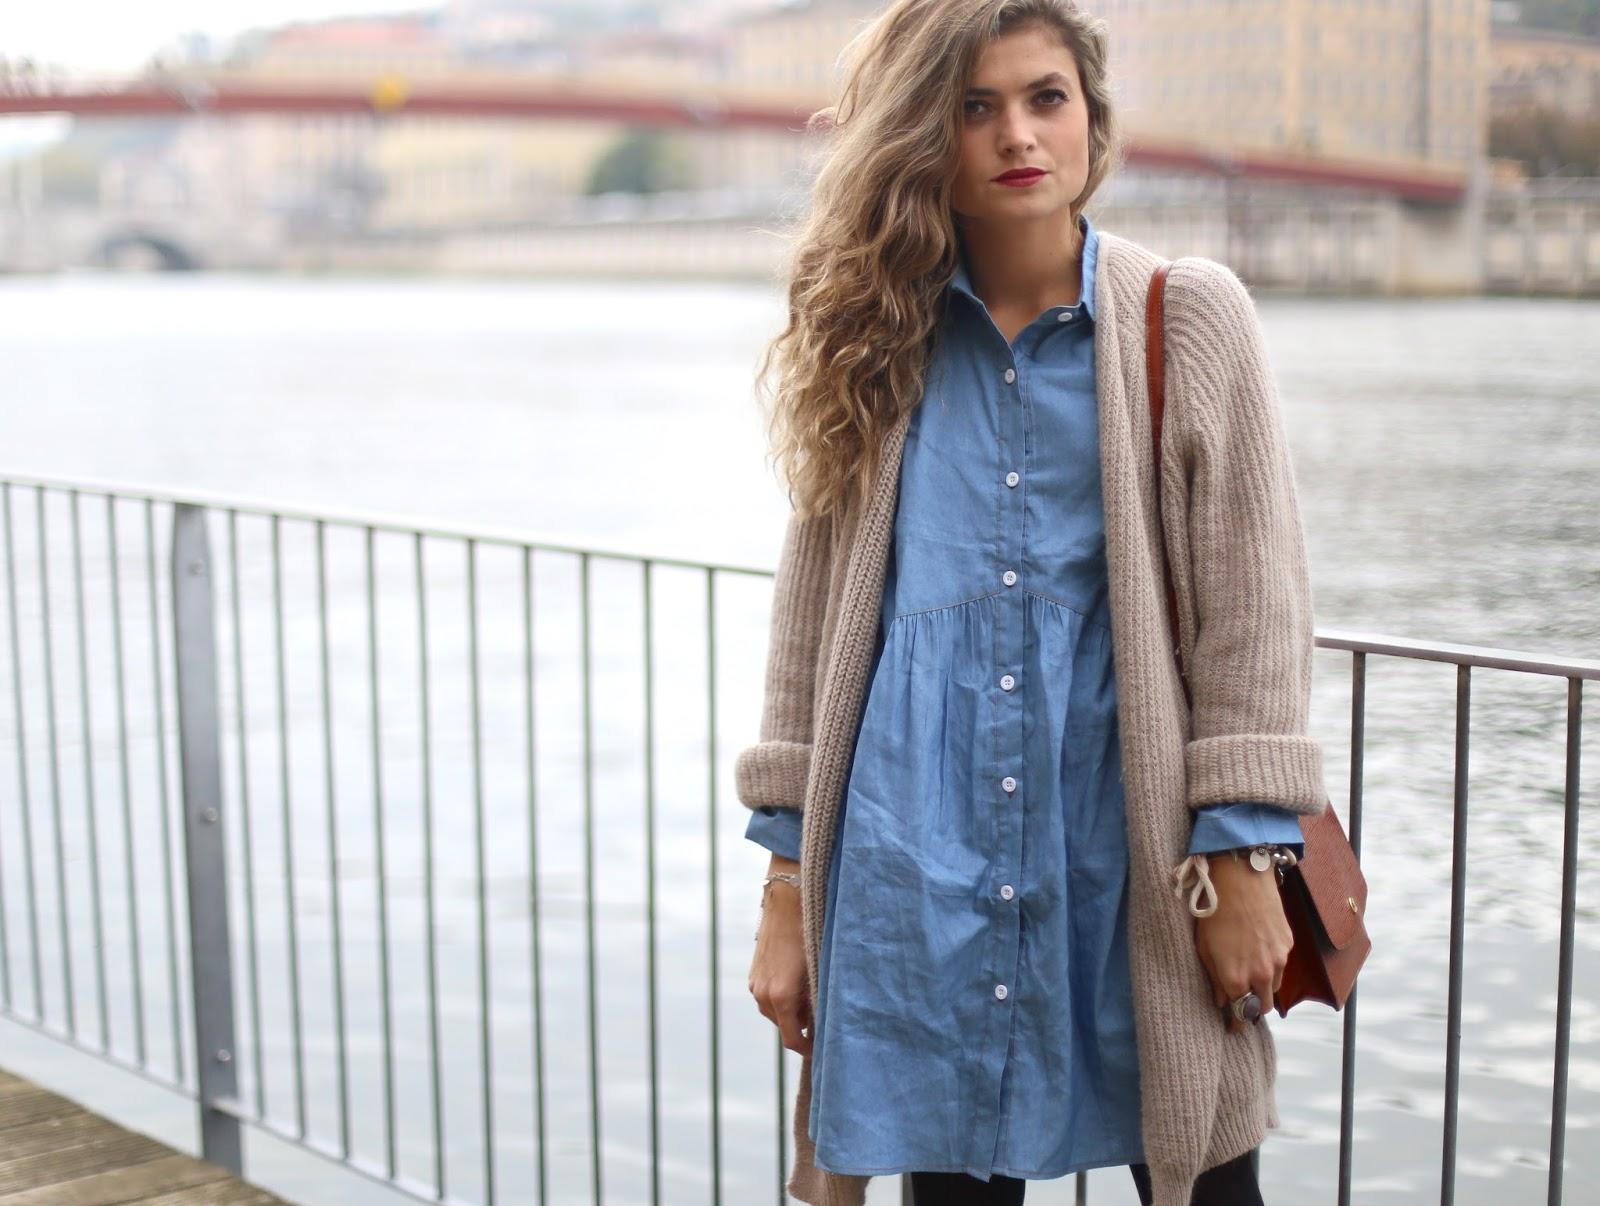 f02eb8572e640 Robe en jeans et gilet oversize - Marie and Mood